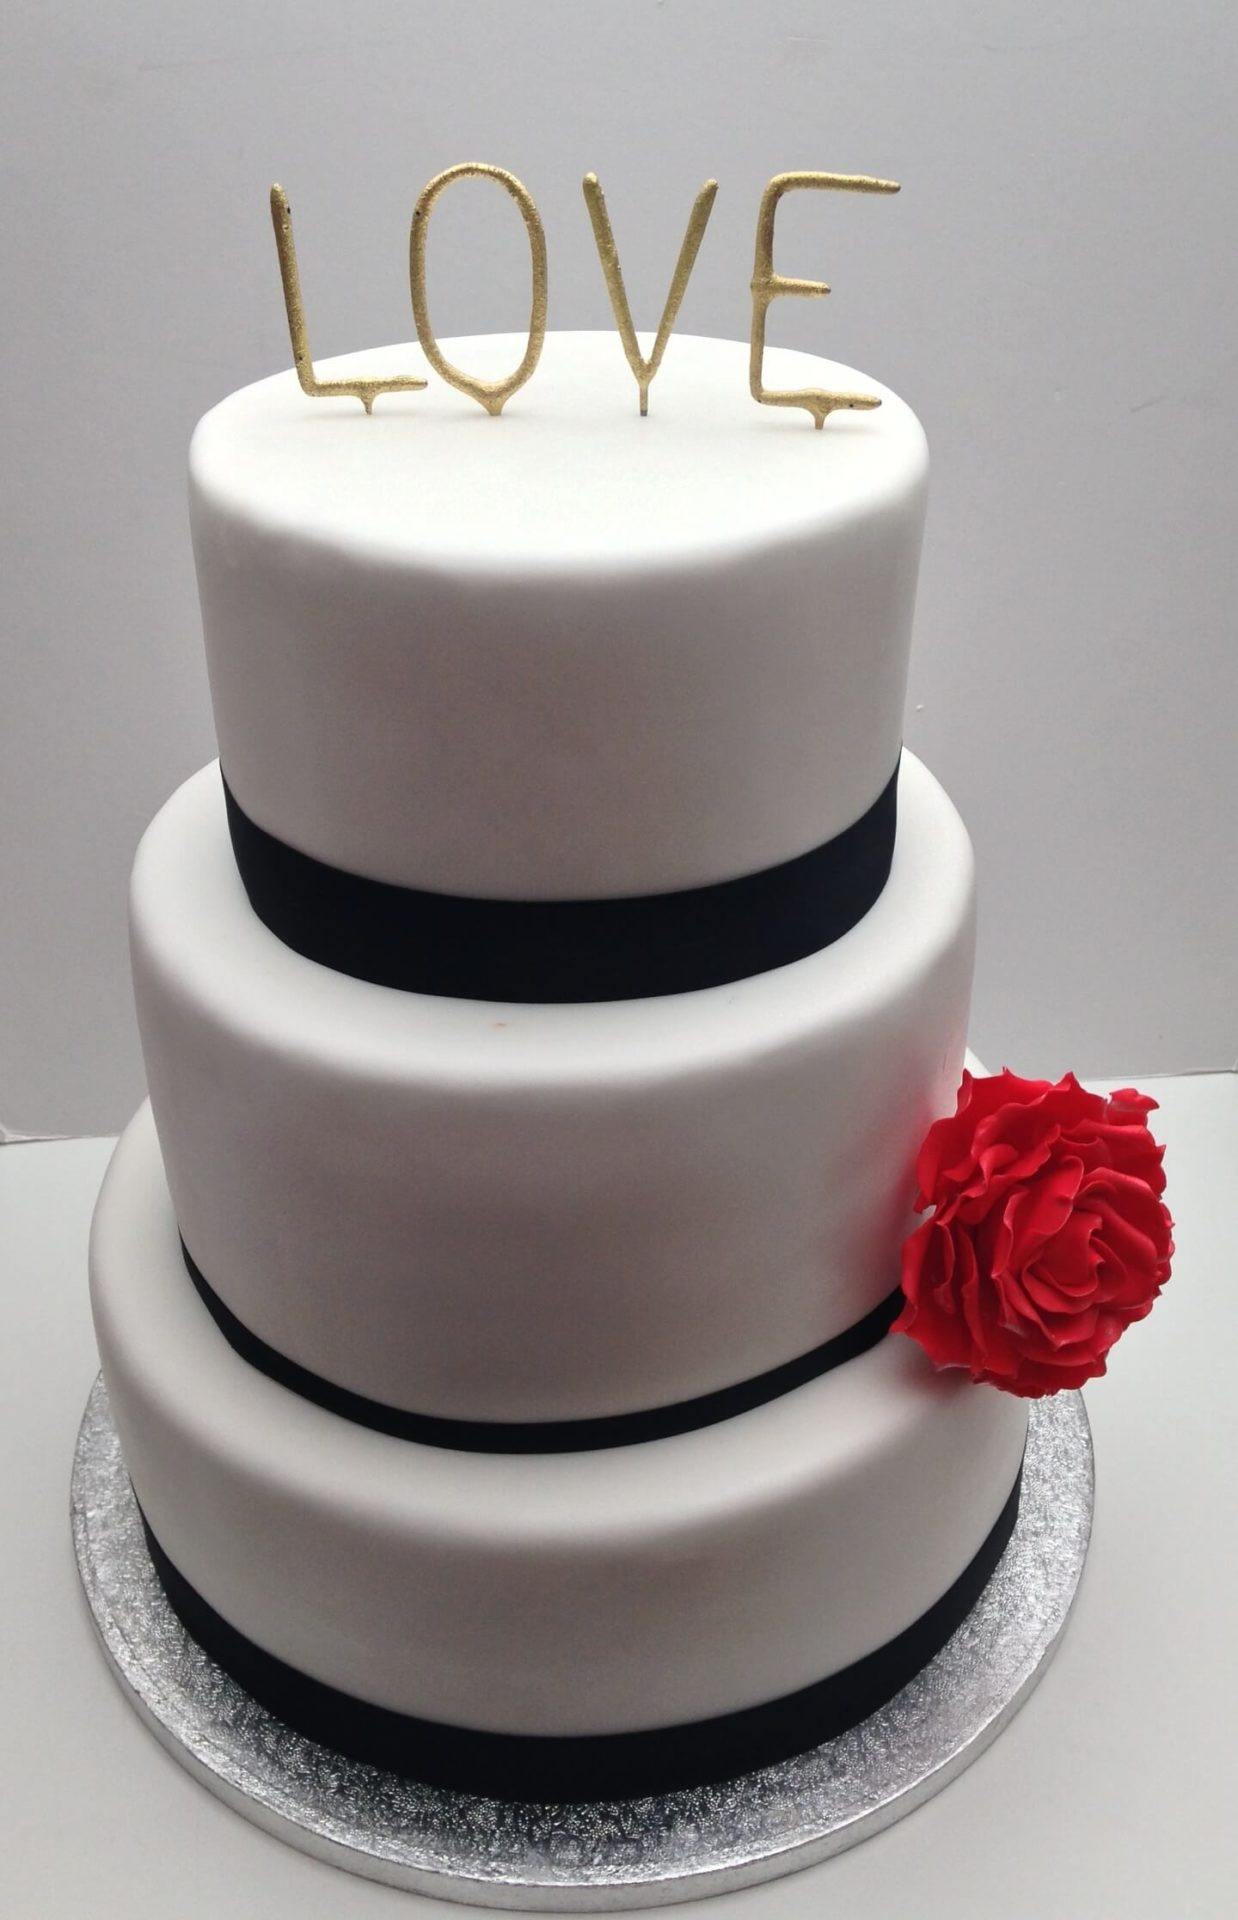 Hochzeitstorte Bestellen  Hochzeitstorte bestellen line Jasi´s Cupcakelädle